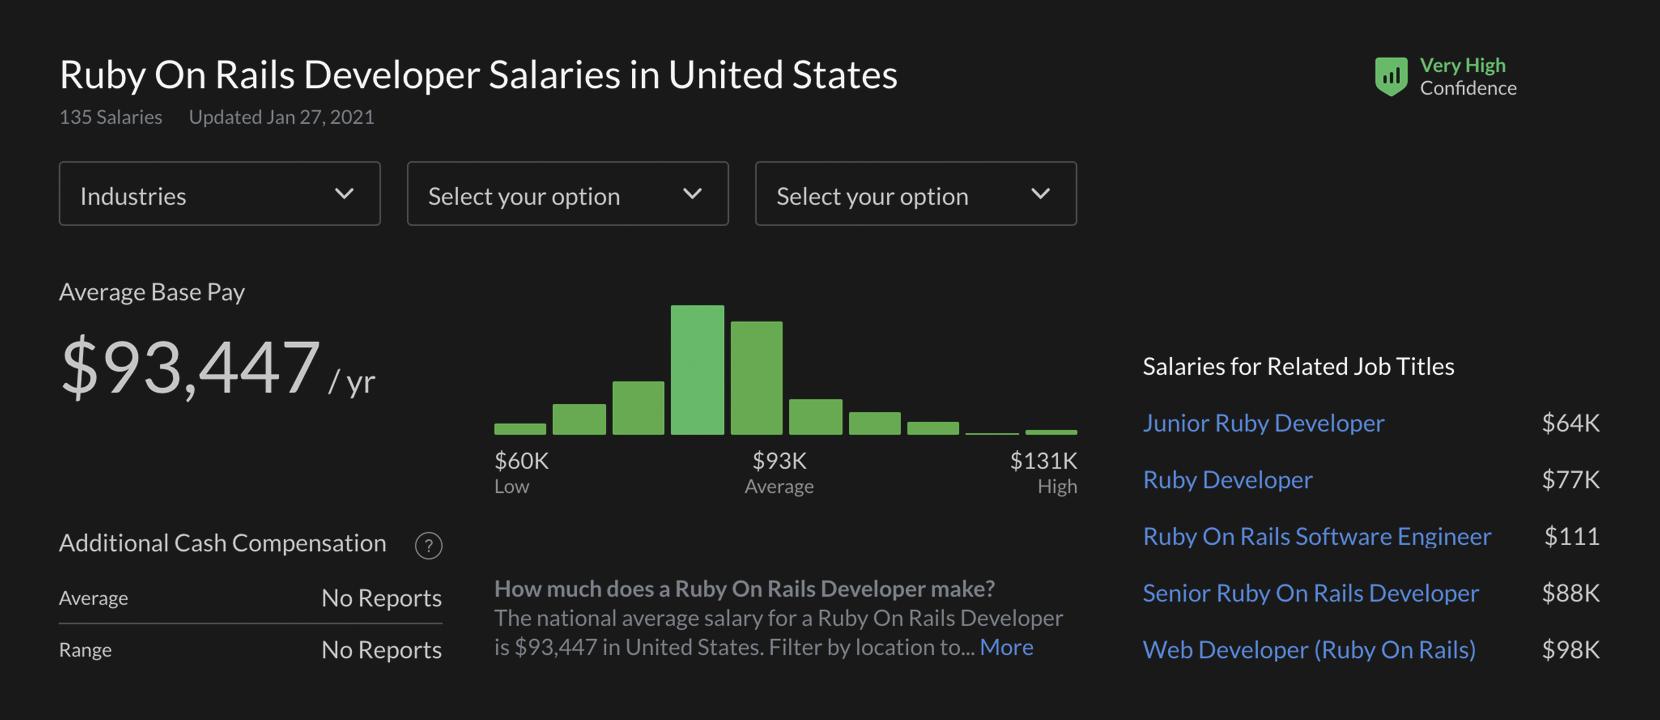 USA ruby on rails devs salaries